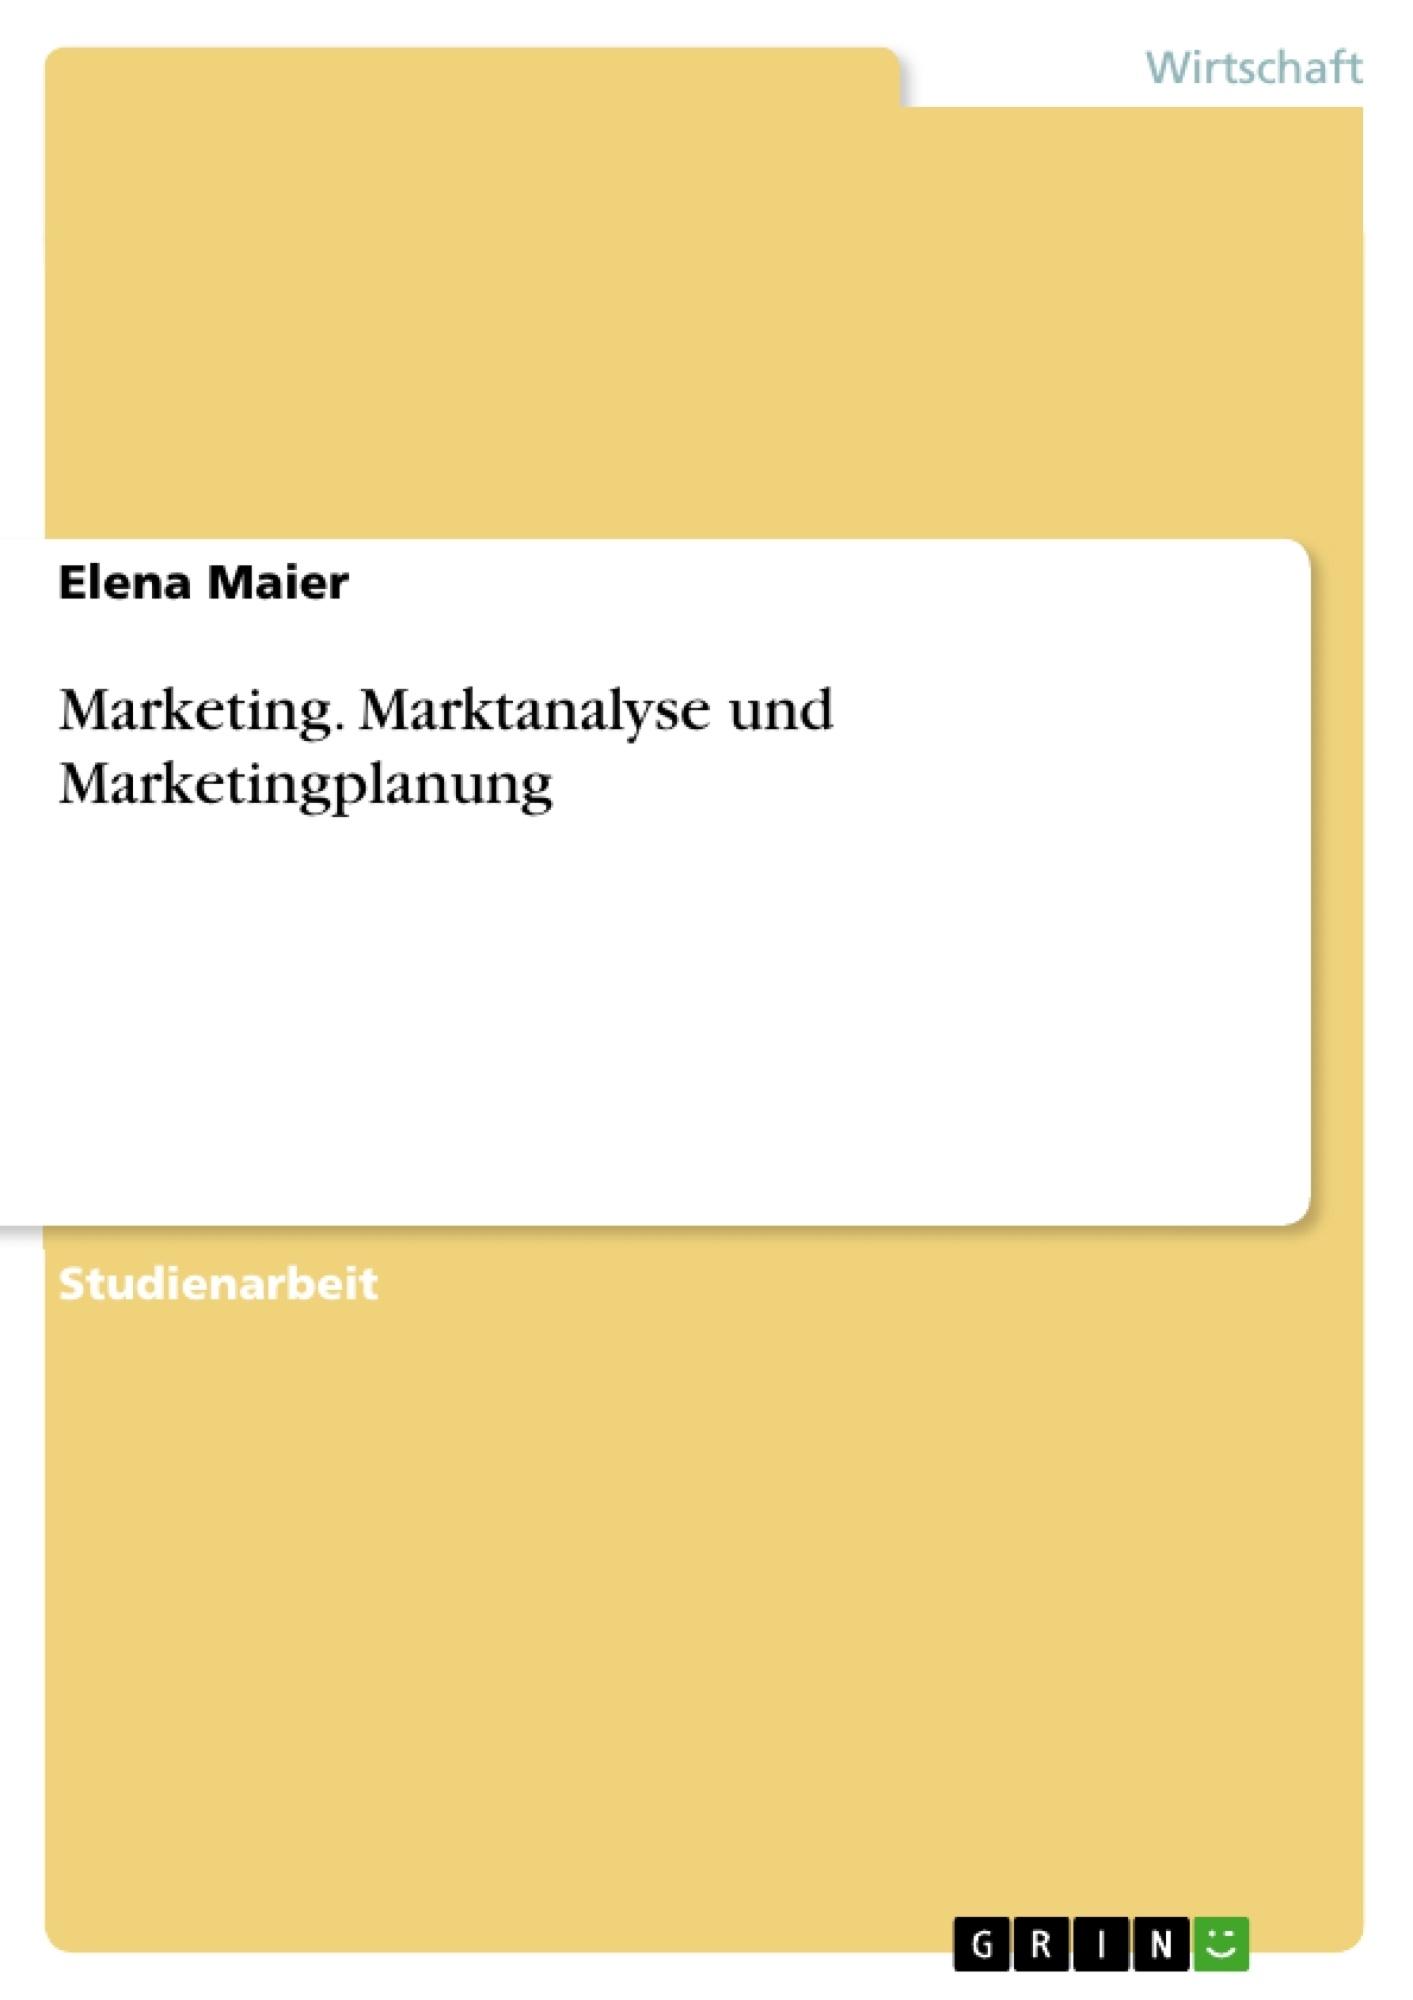 Titel: Marketing. Marktanalyse und Marketingplanung